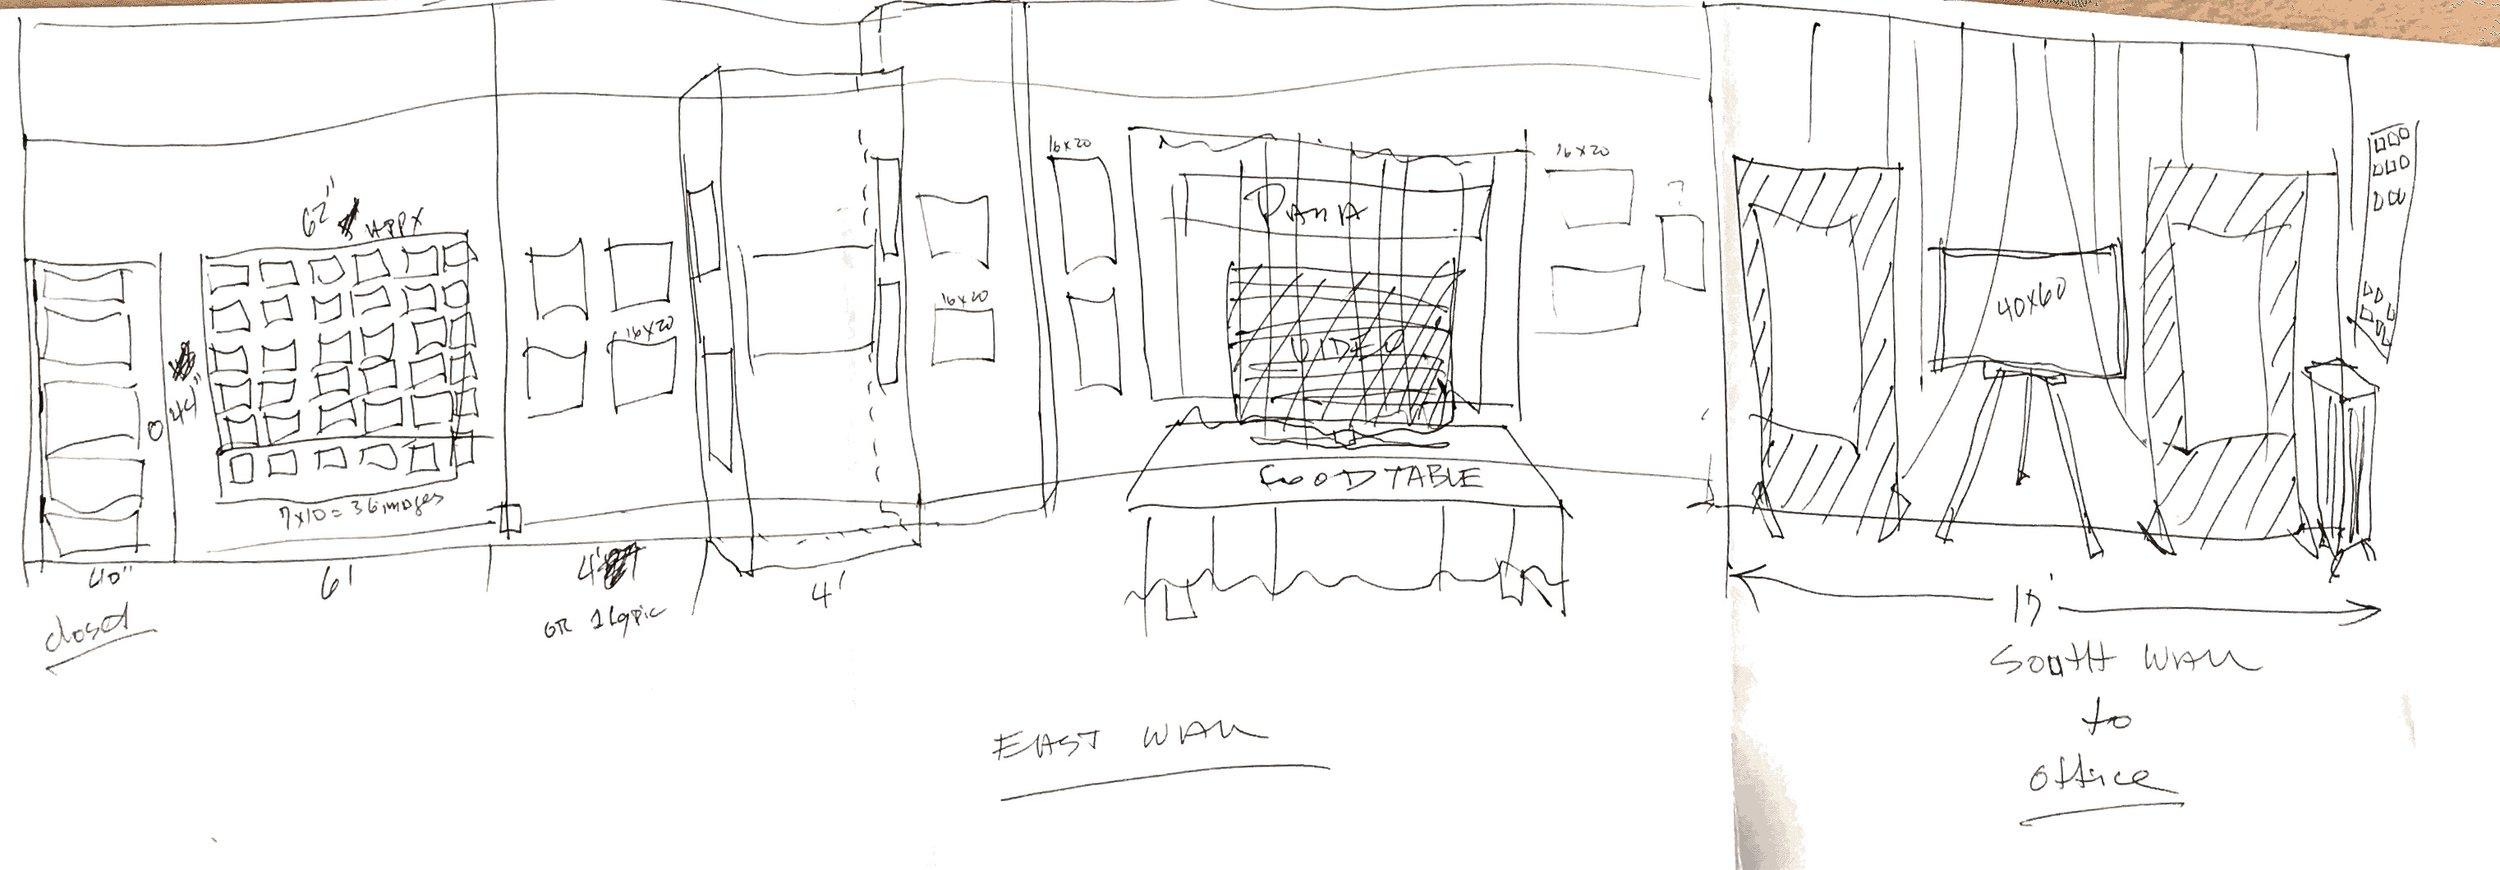 Ward Russel gallery sketch 2